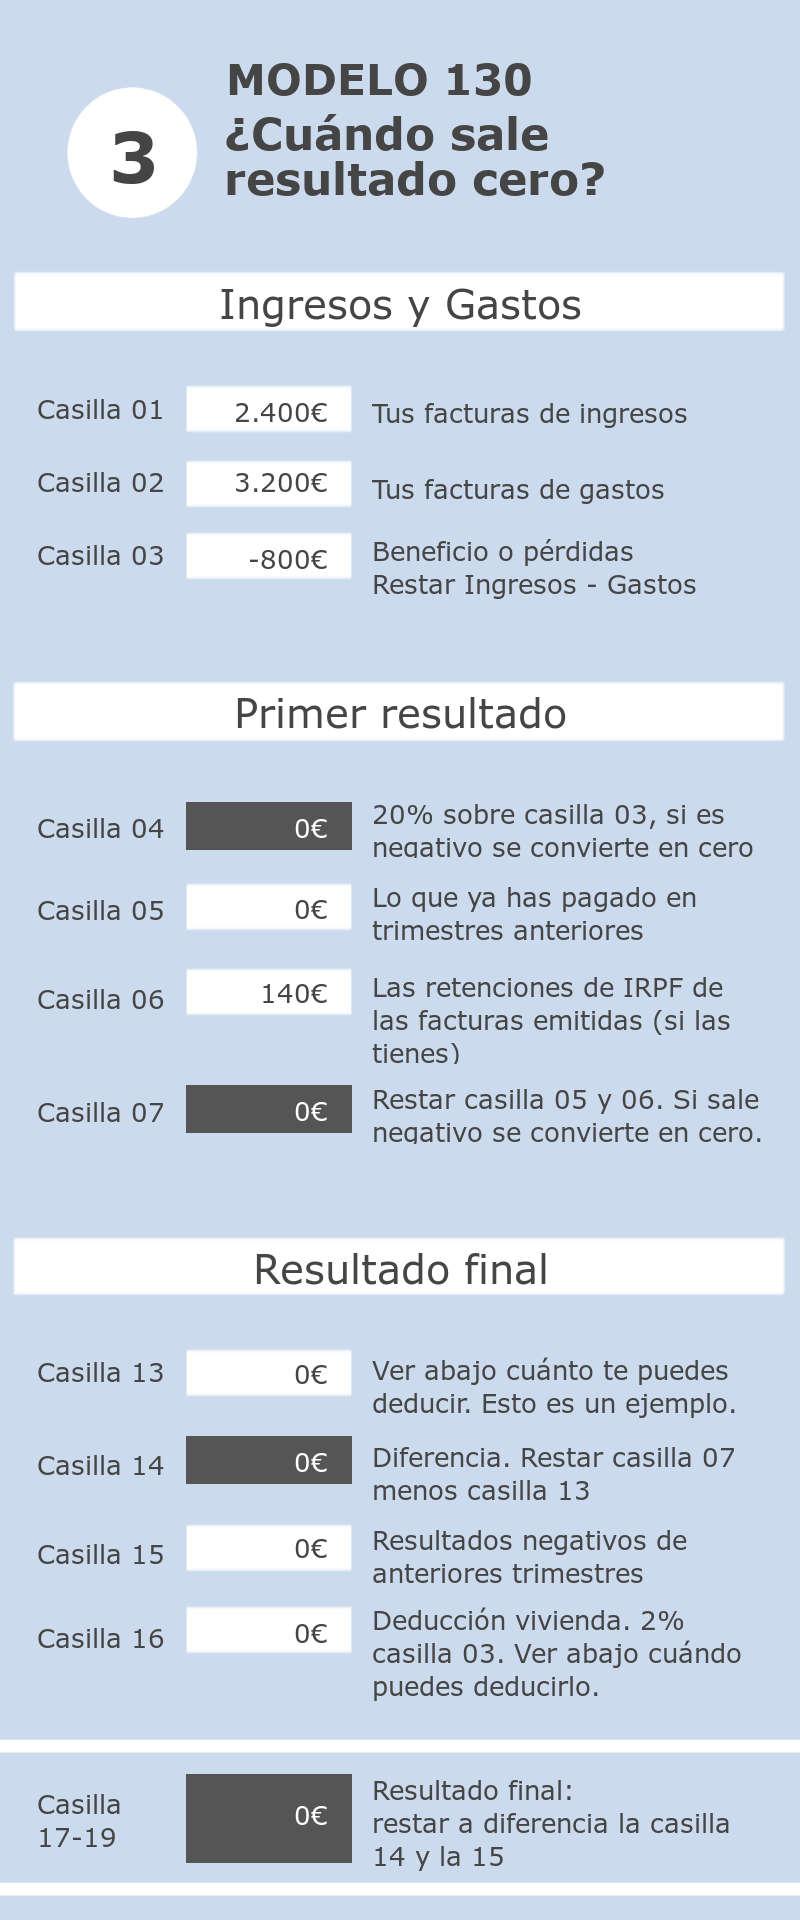 Modelo 130 resultado cero